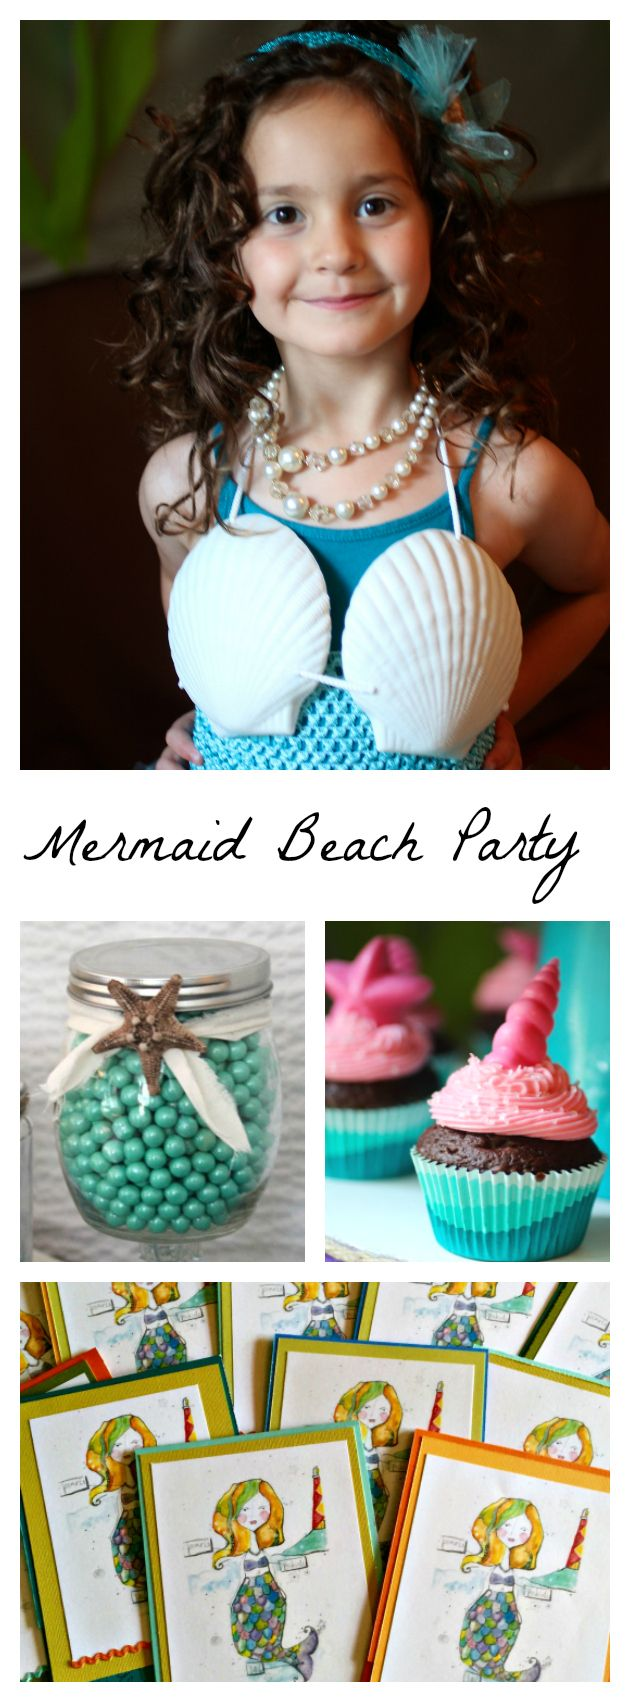 mermaid beach party game ideas you can make pinterest birthday